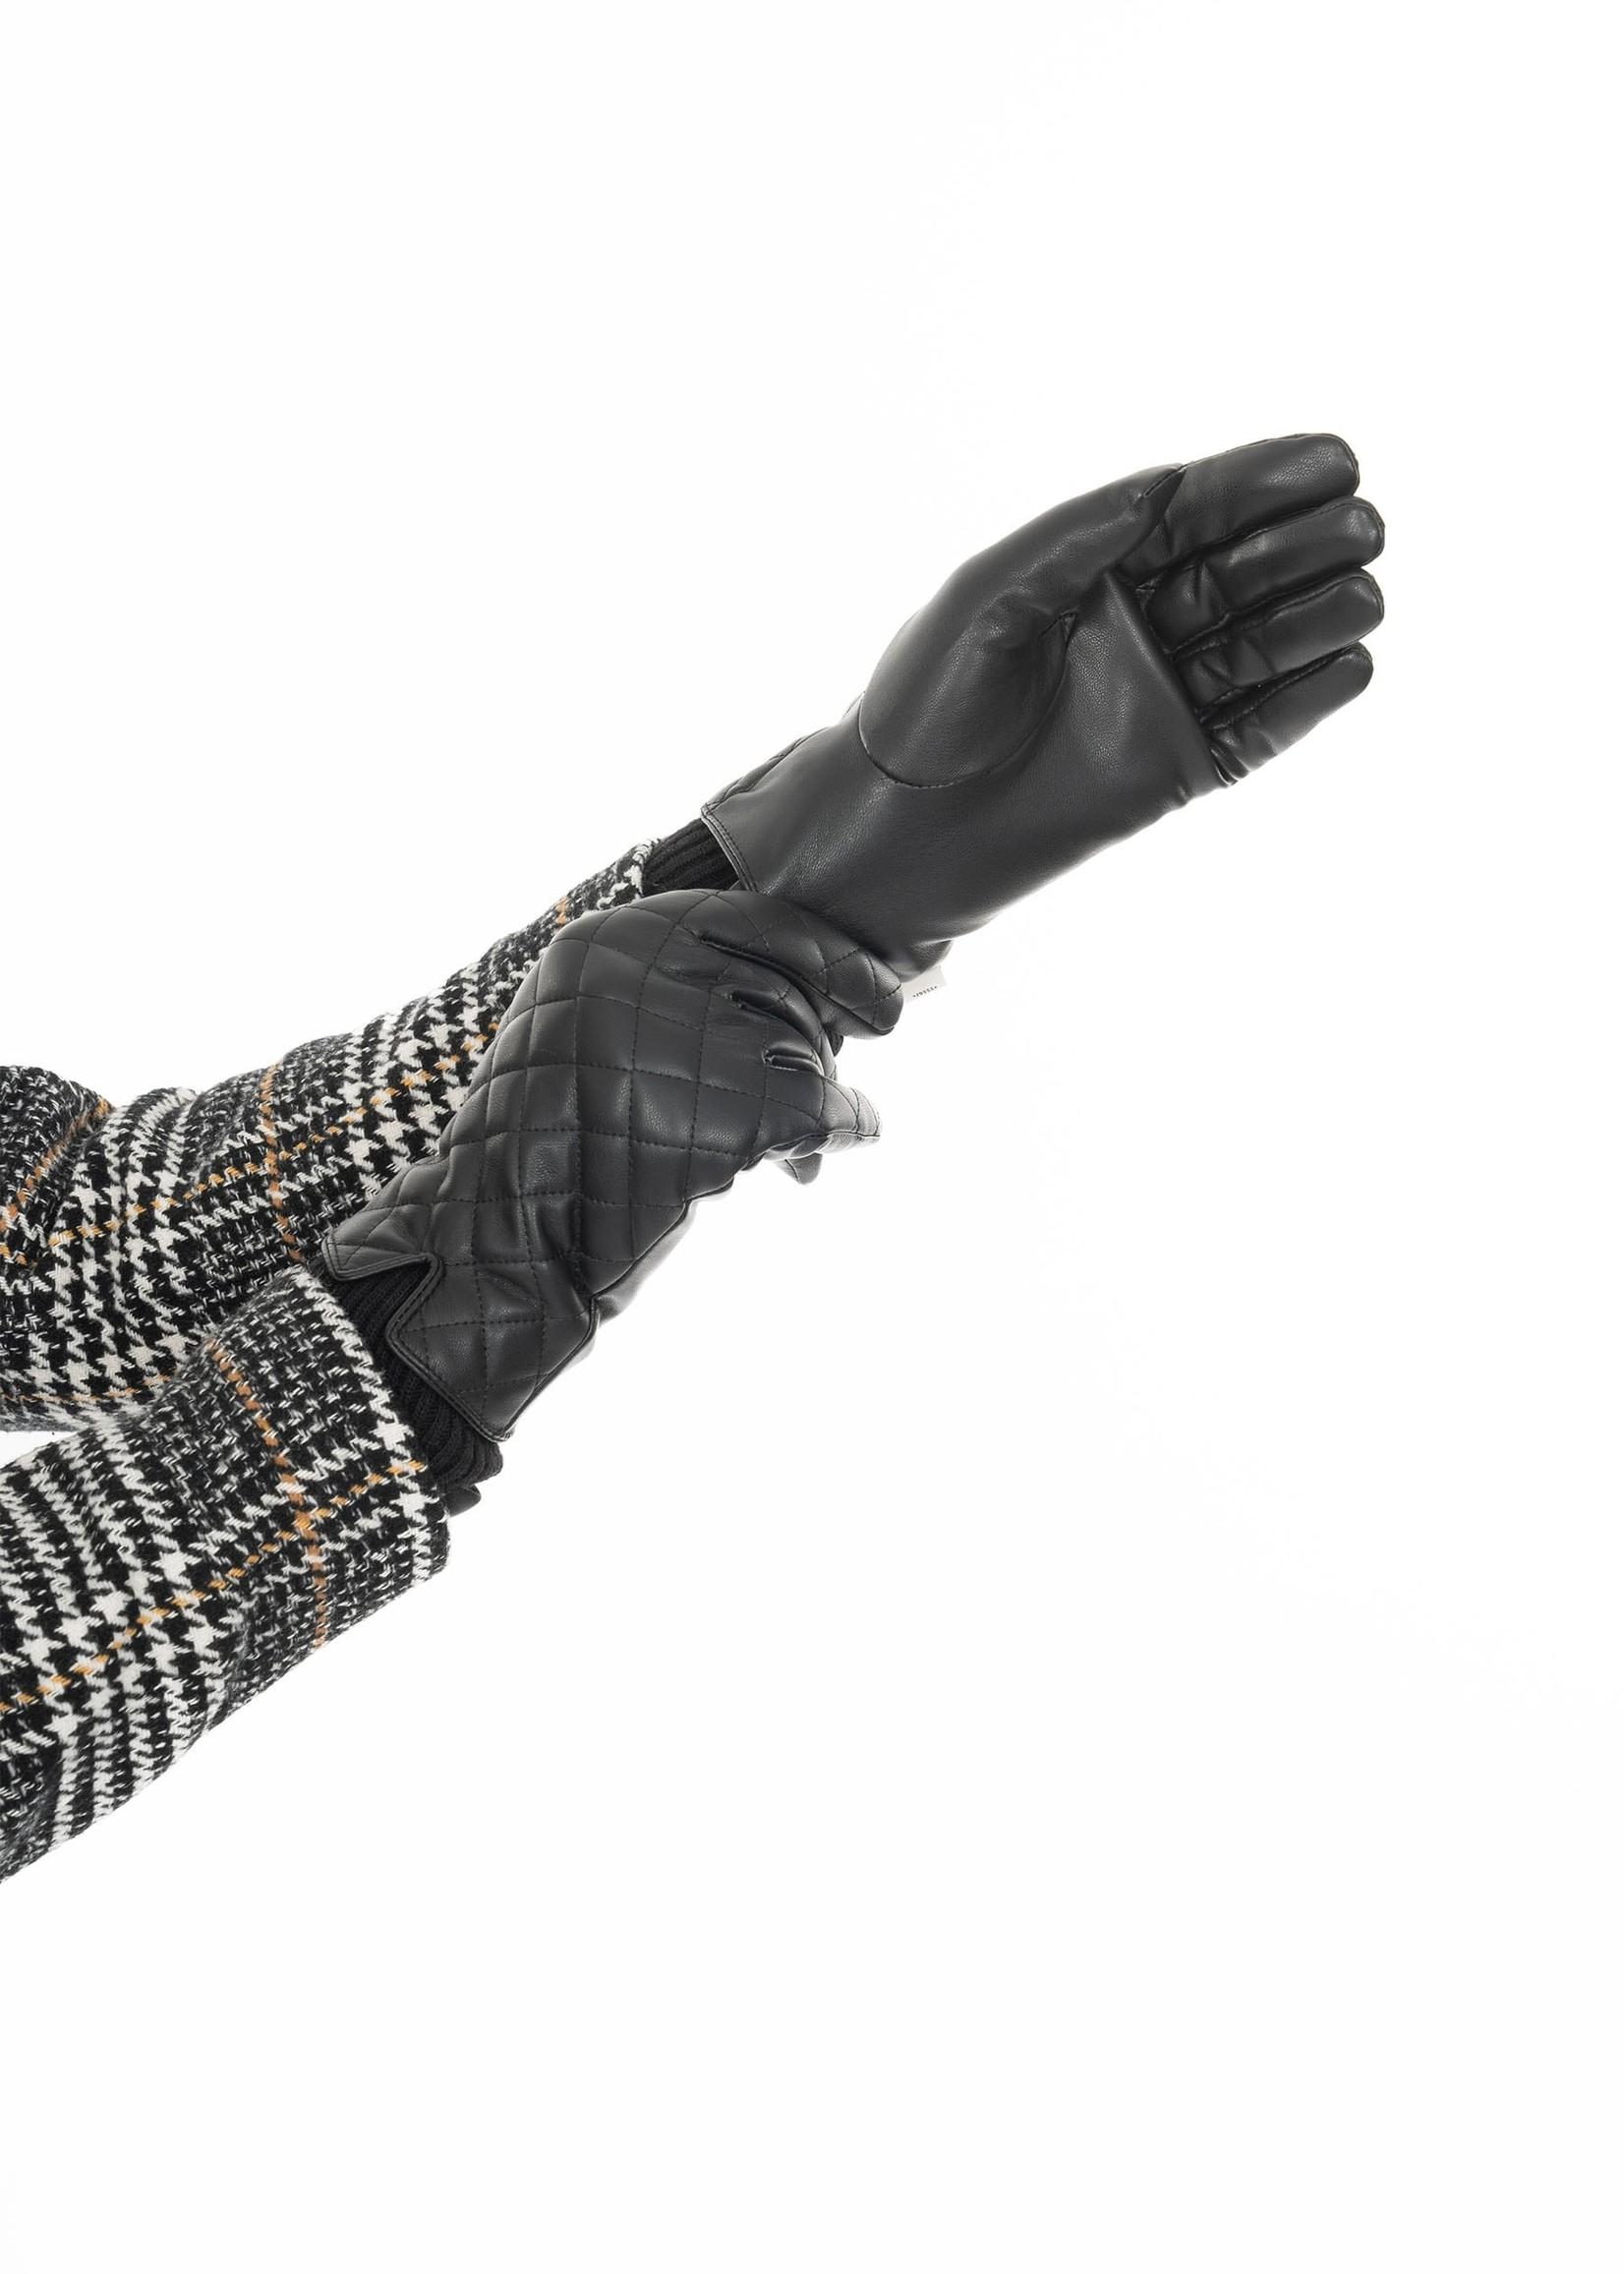 ZUSSS chique handschoen zwart